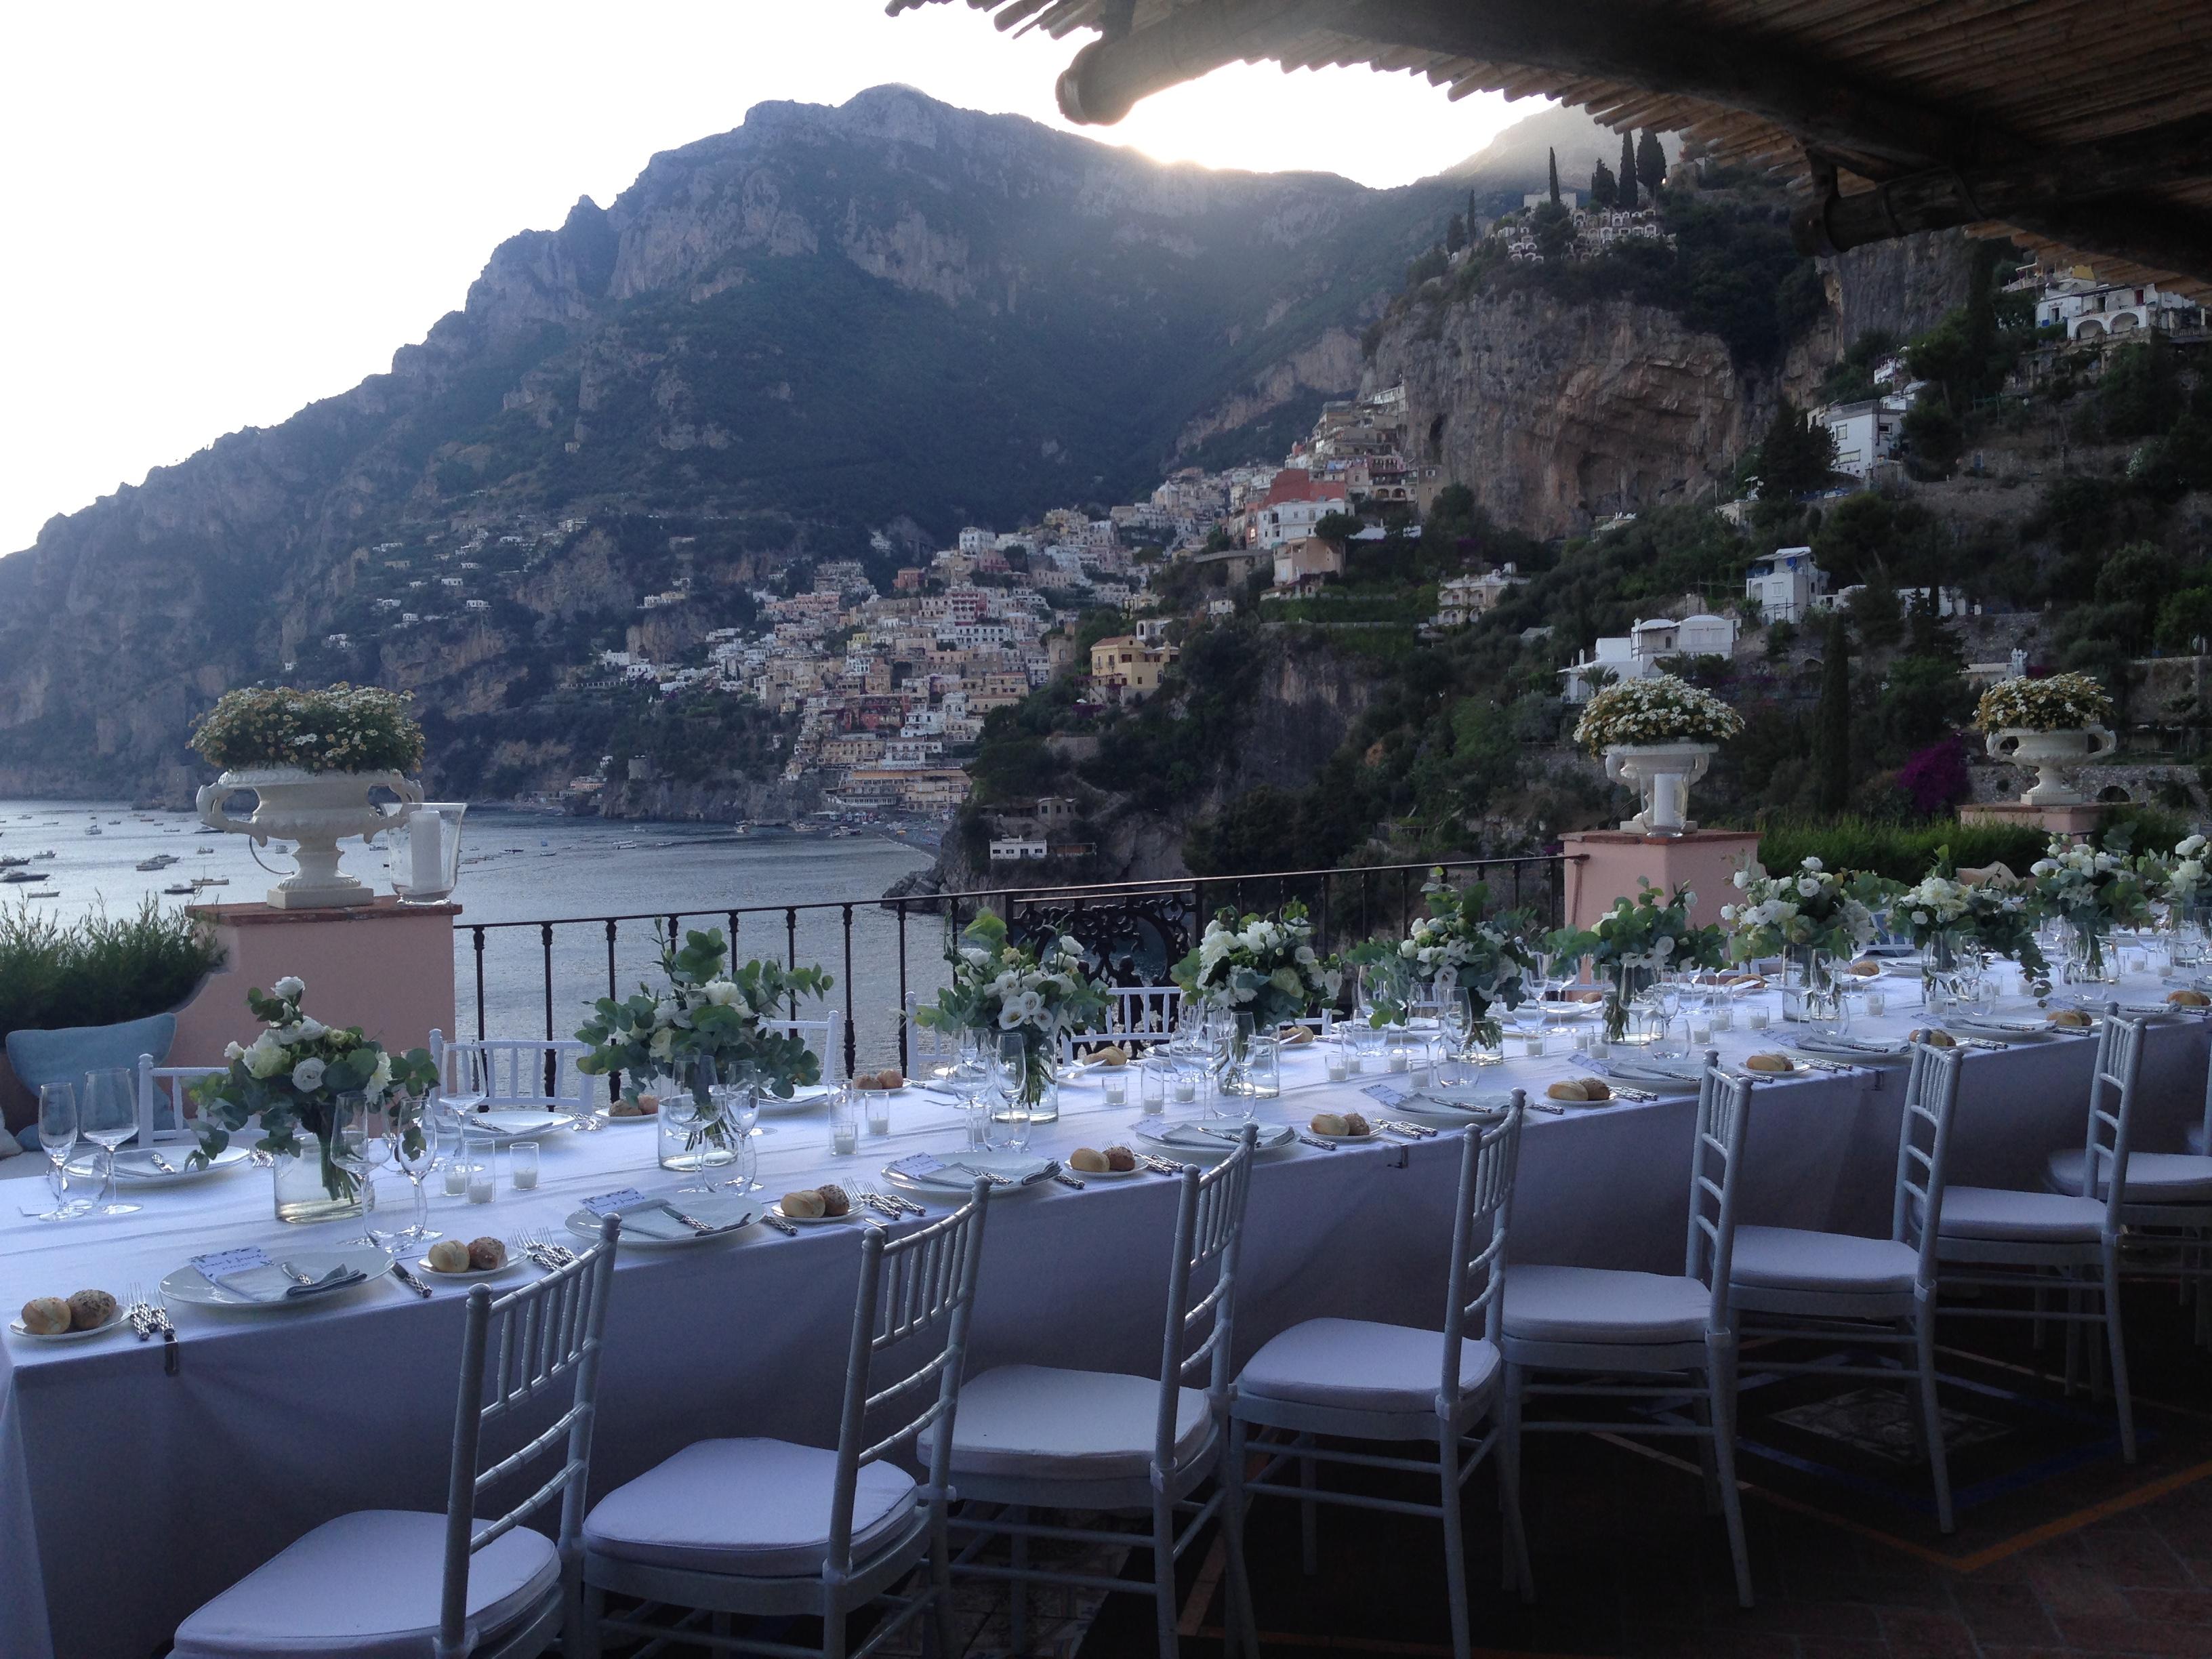 https://www.weddingamalfi.com/wp-content/uploads/Laura-and-Jarrod-wedding-table-decorations.jpg